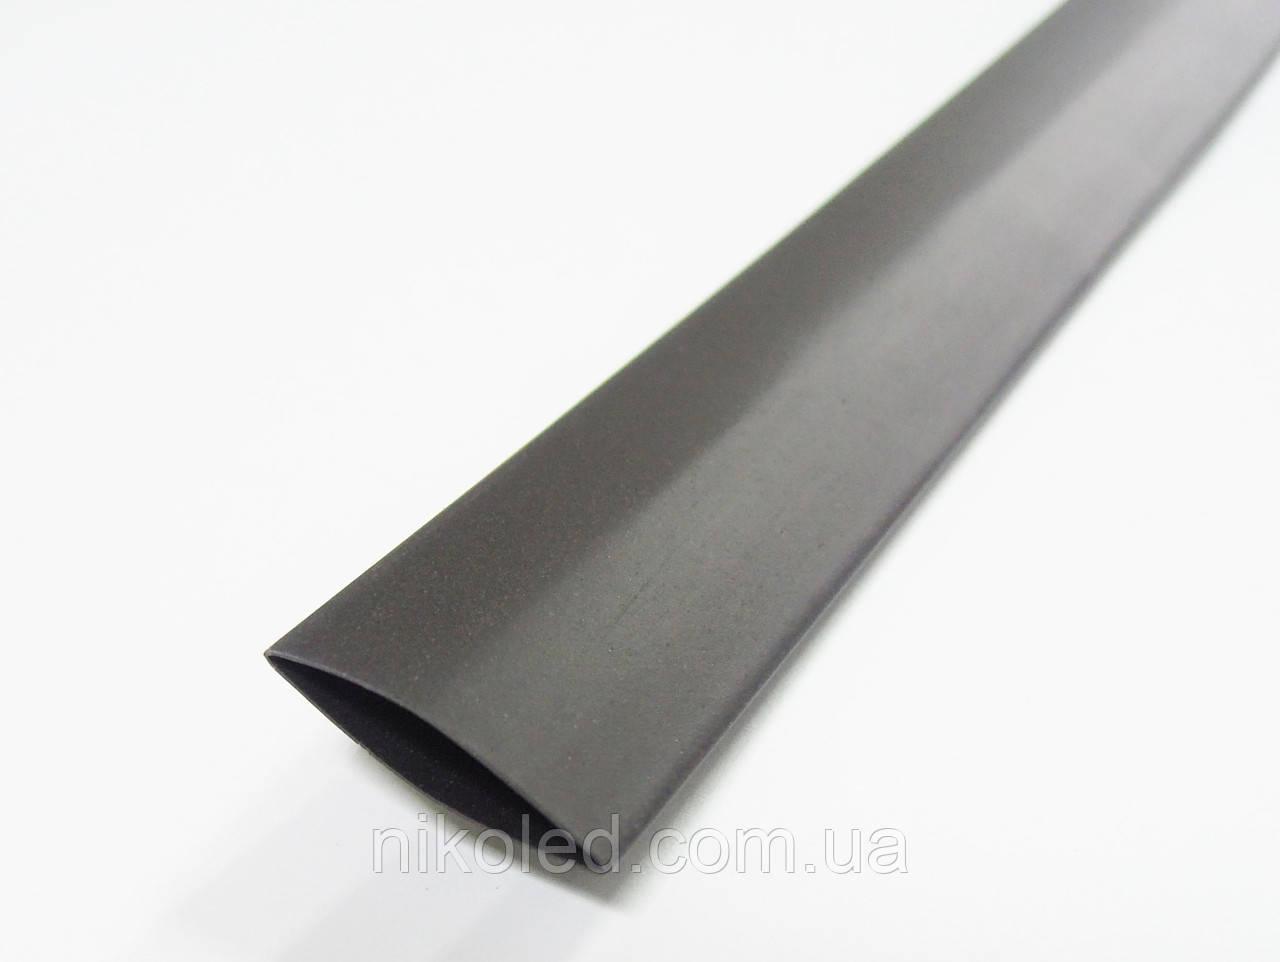 Термоусадочная трубка 12 / 6мм черная 1м